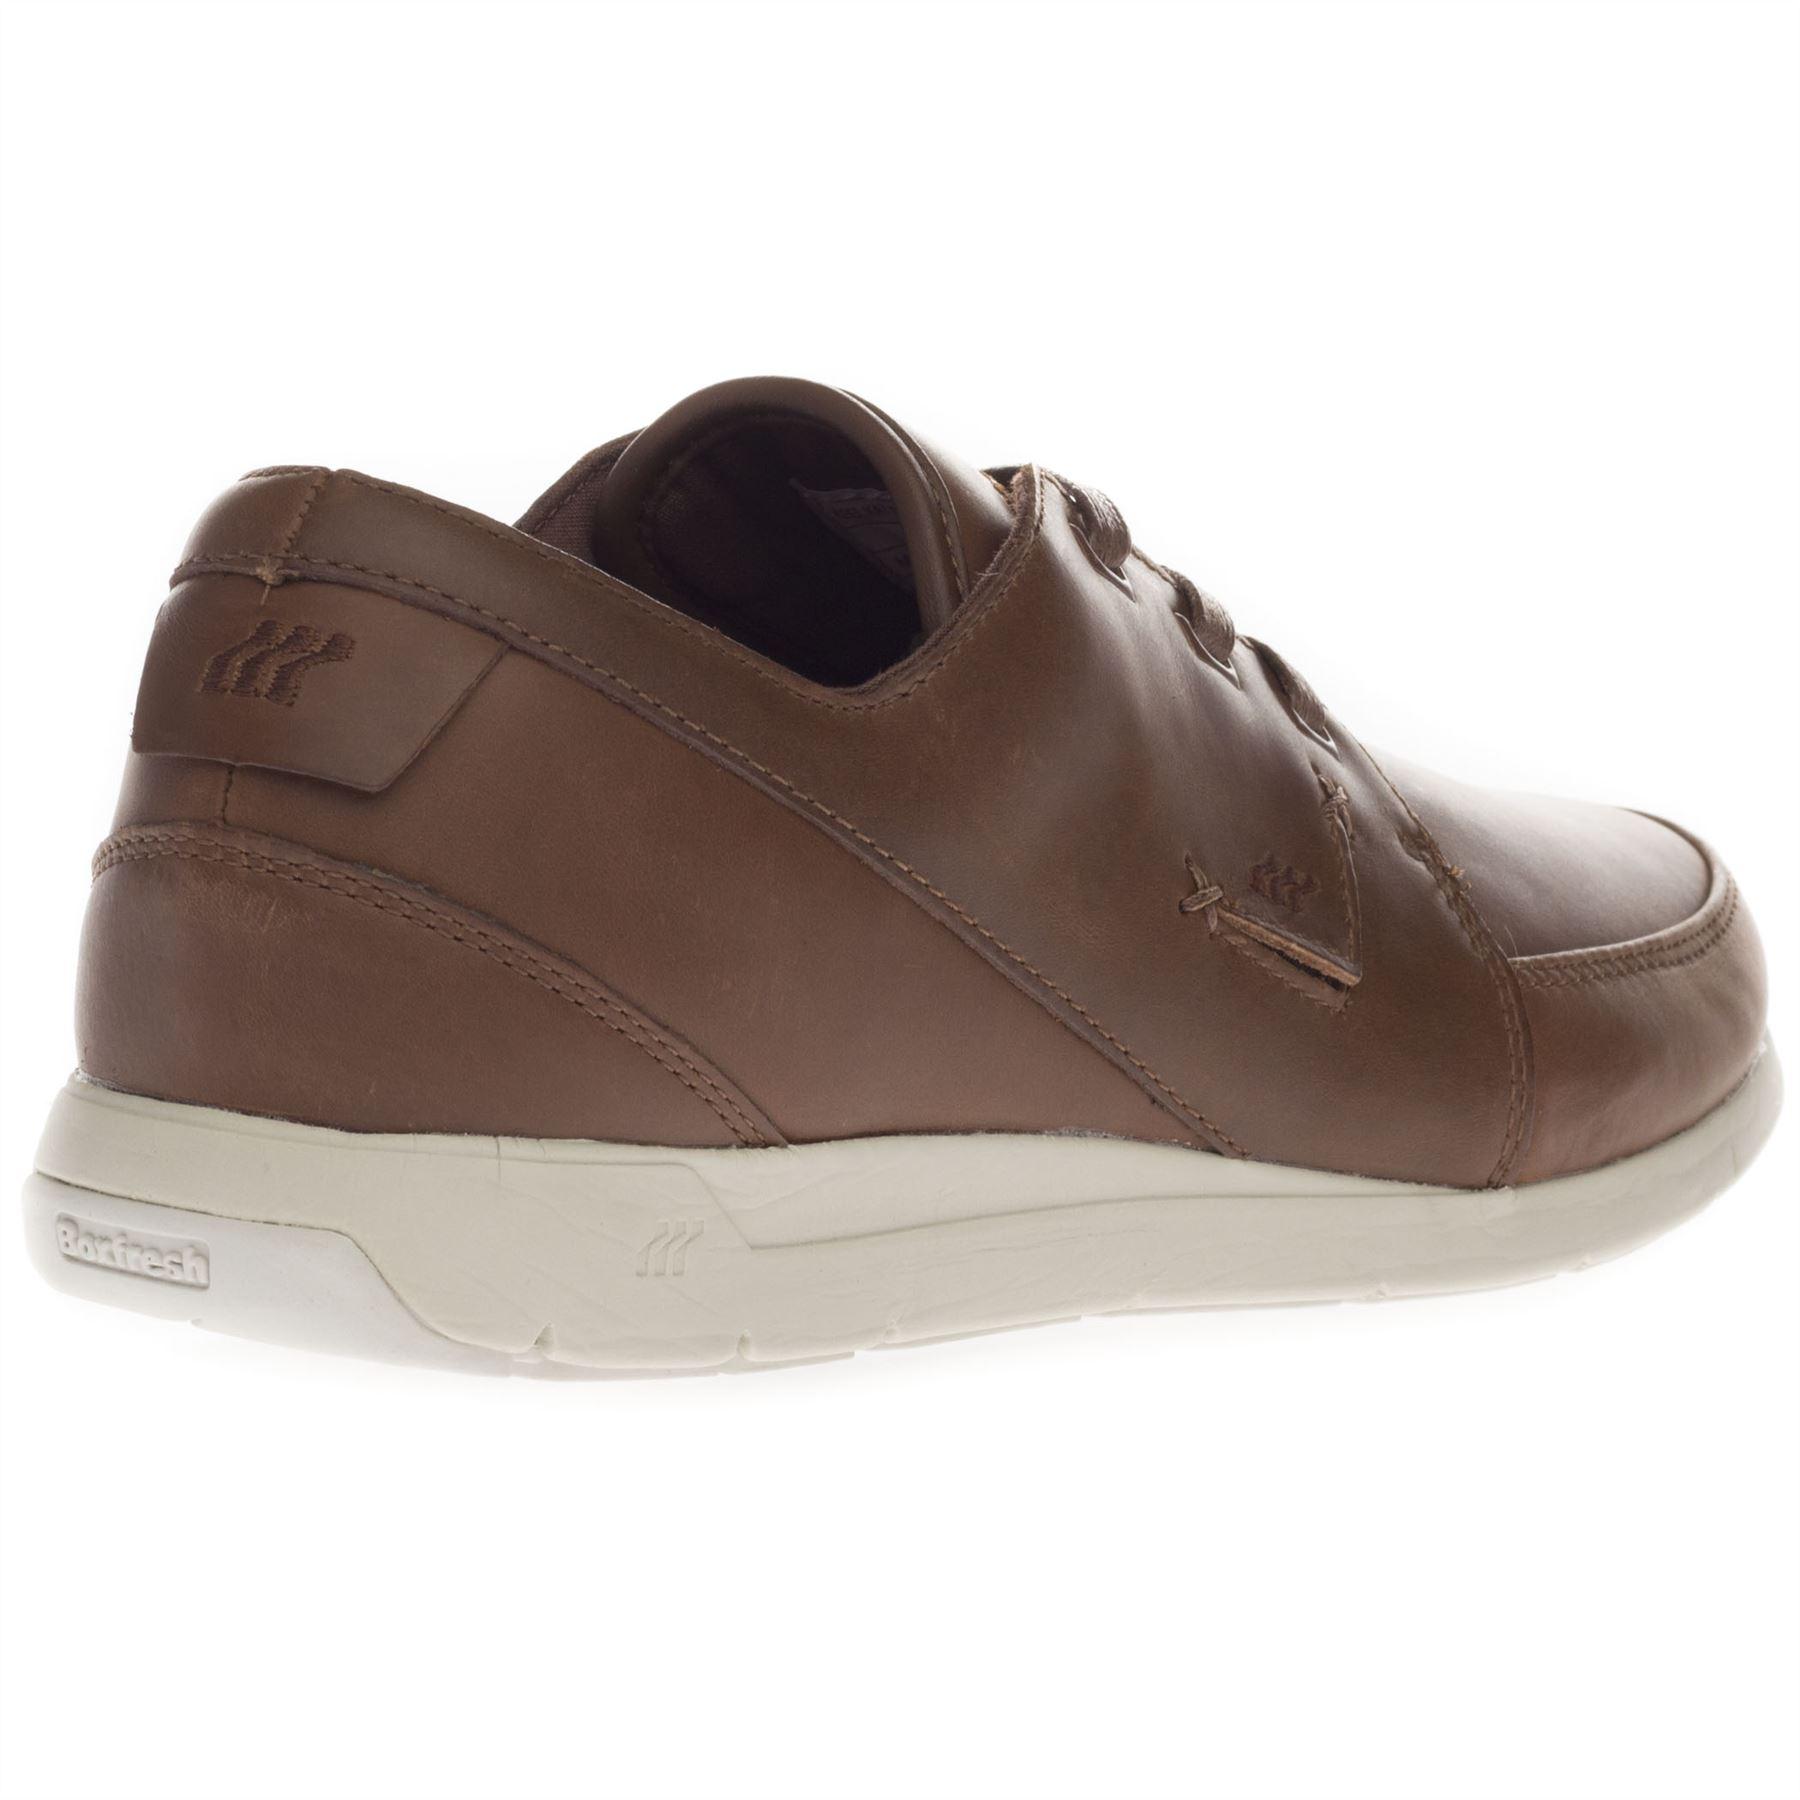 Boxfresh Men's Clyston Ampton Shepperton Casual Black Brown Grey Trainers Shoes